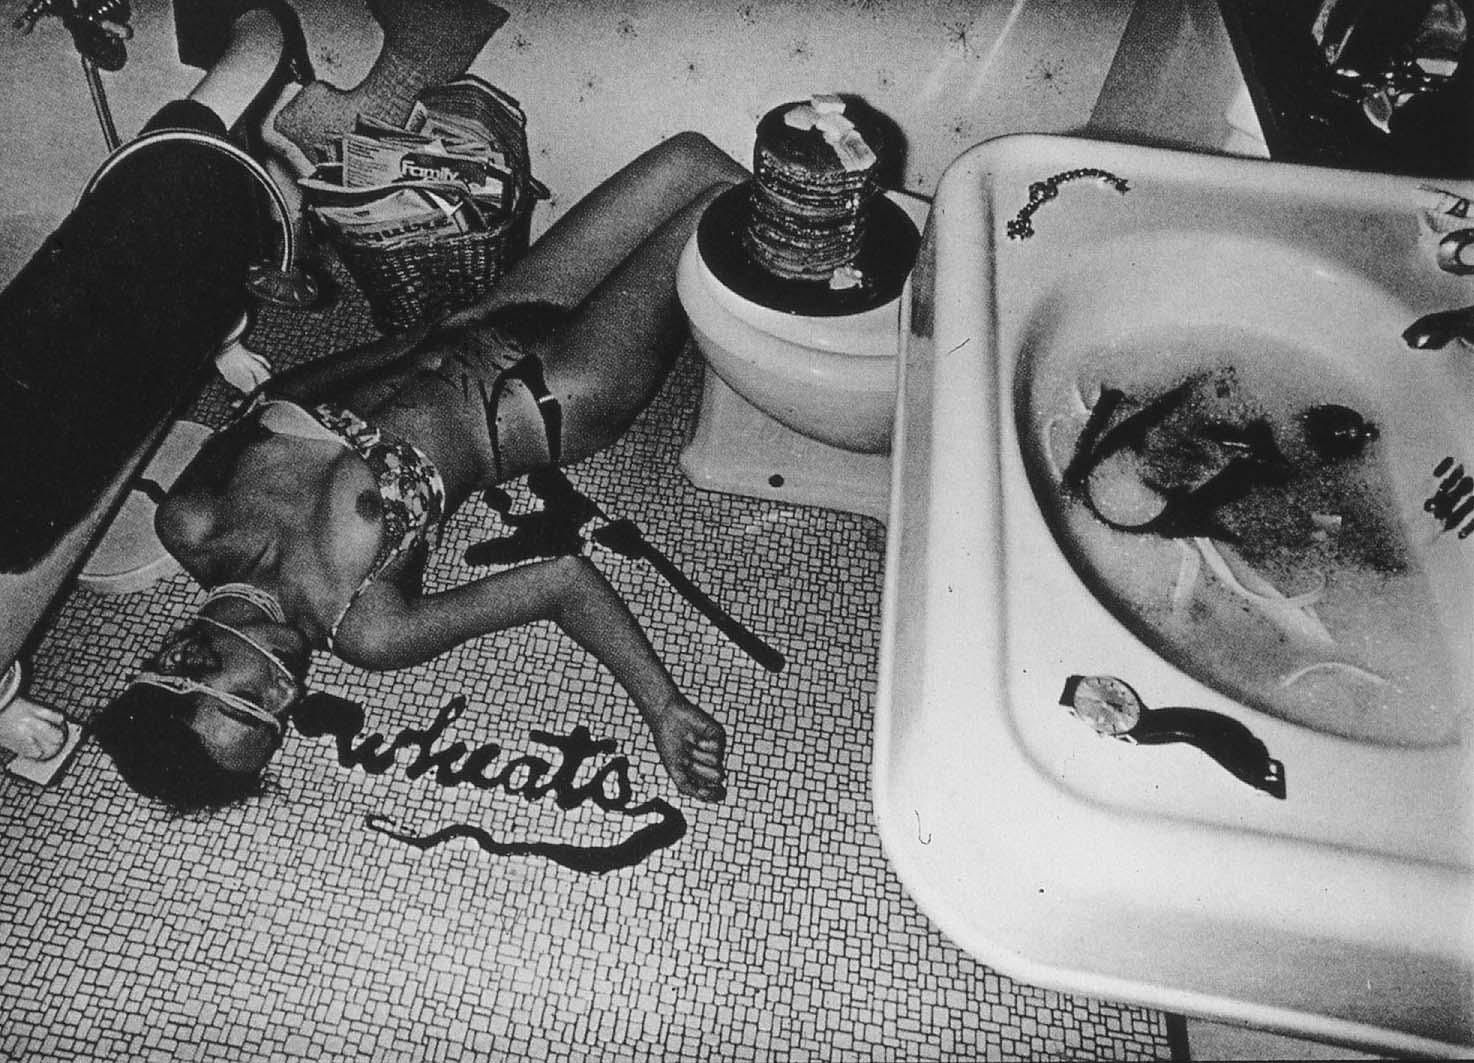 Les Krims, Wheats, Buffalo, New York del 1969